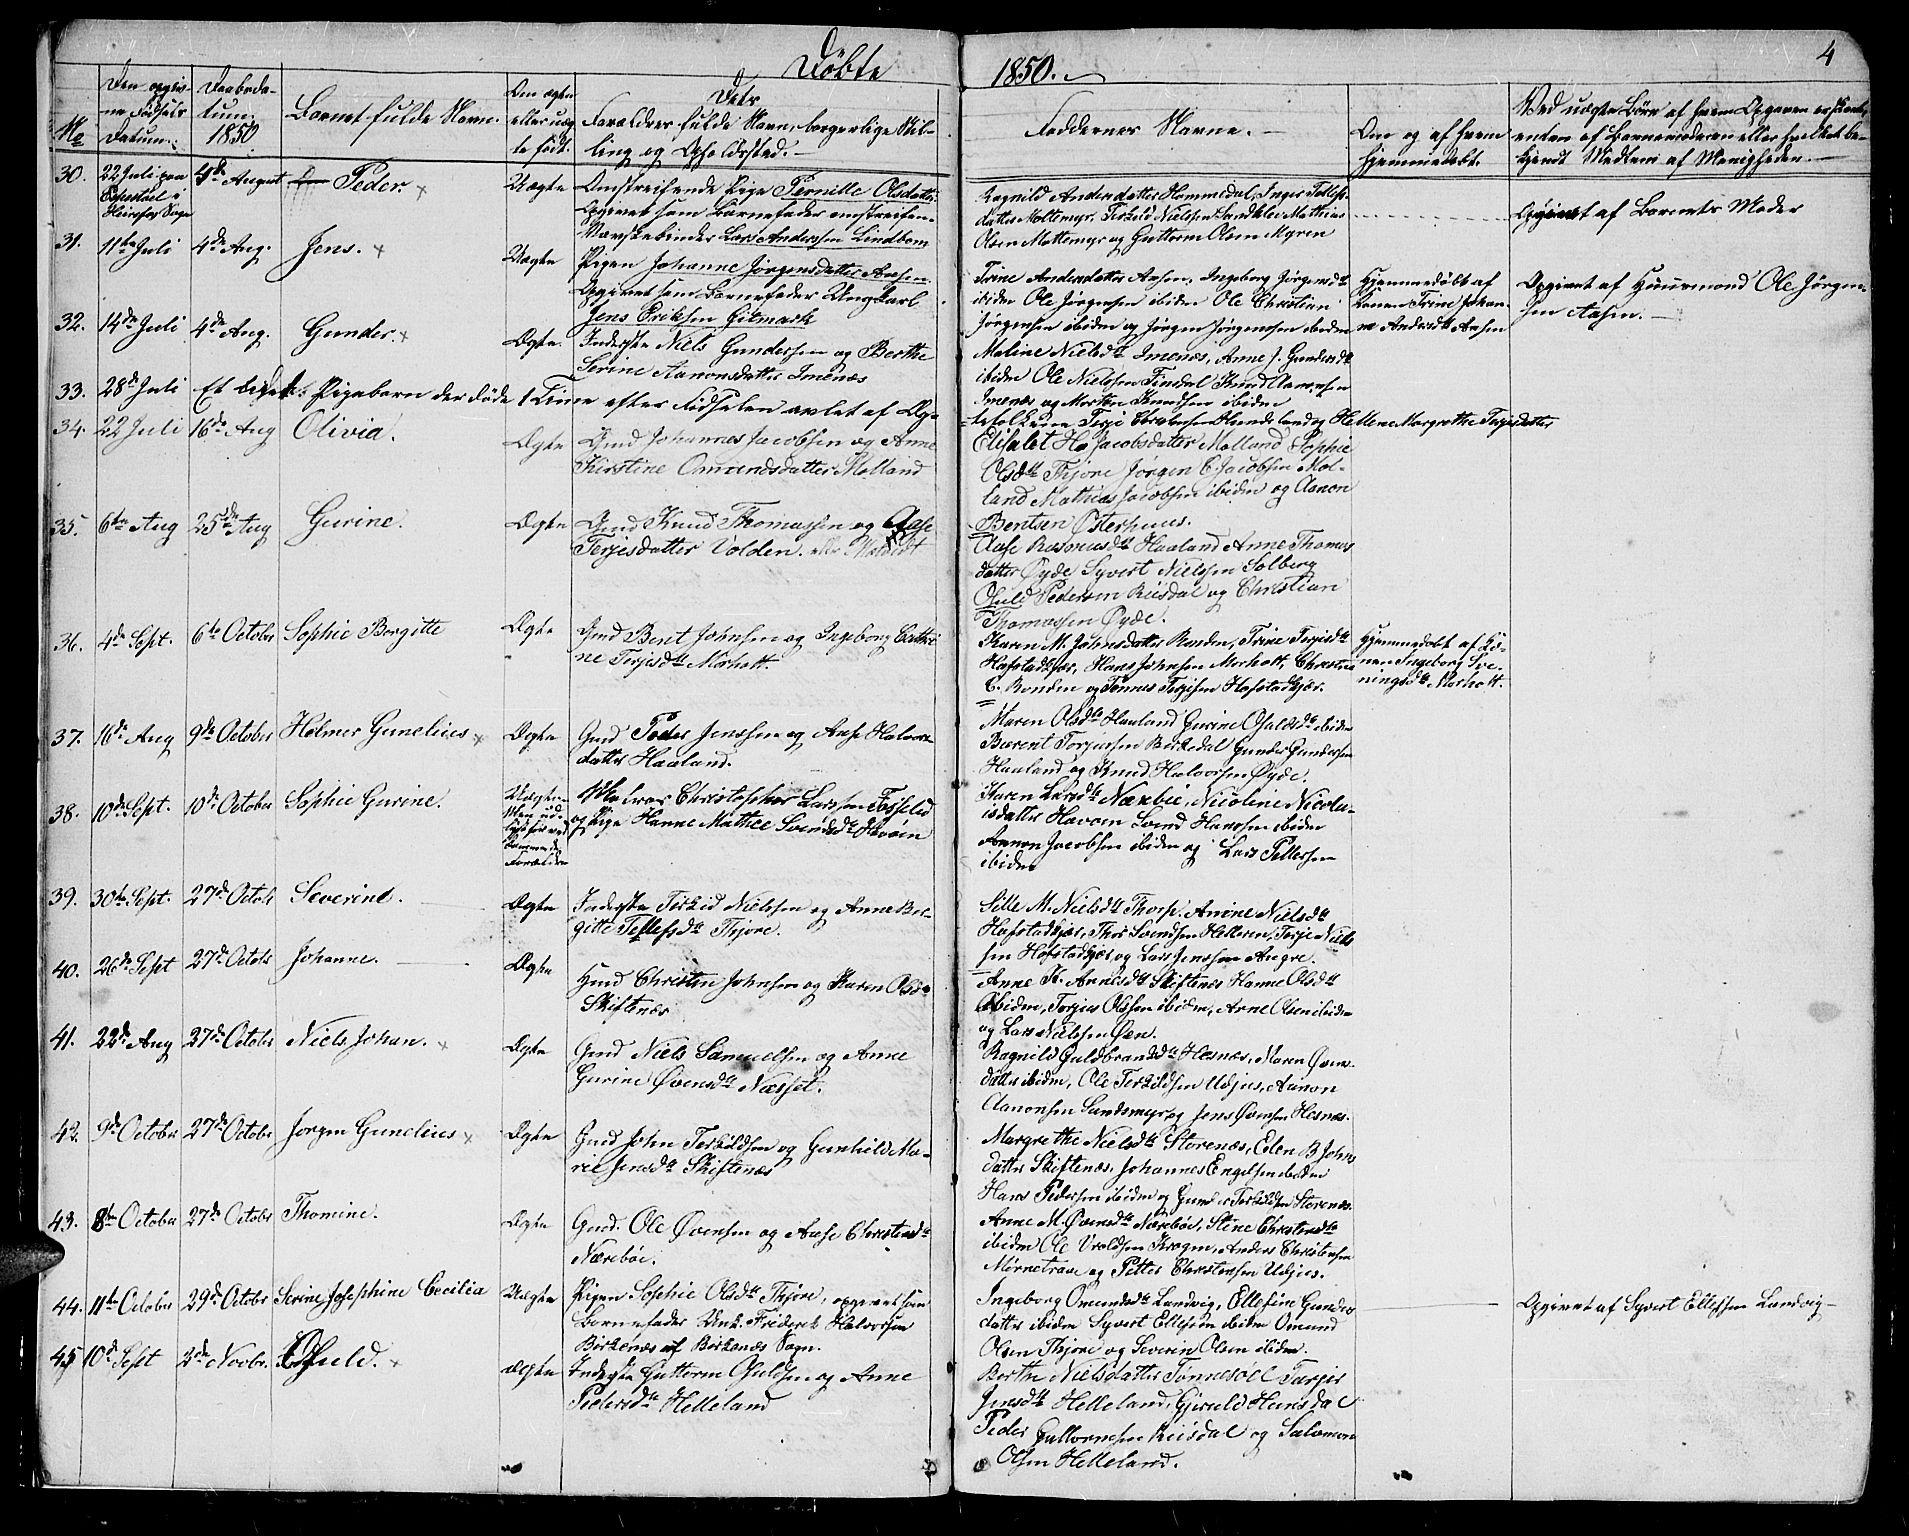 SAK, Hommedal sokneprestkontor, F/Fb/Fbb/L0005: Klokkerbok nr. B 5, 1850-1869, s. 4